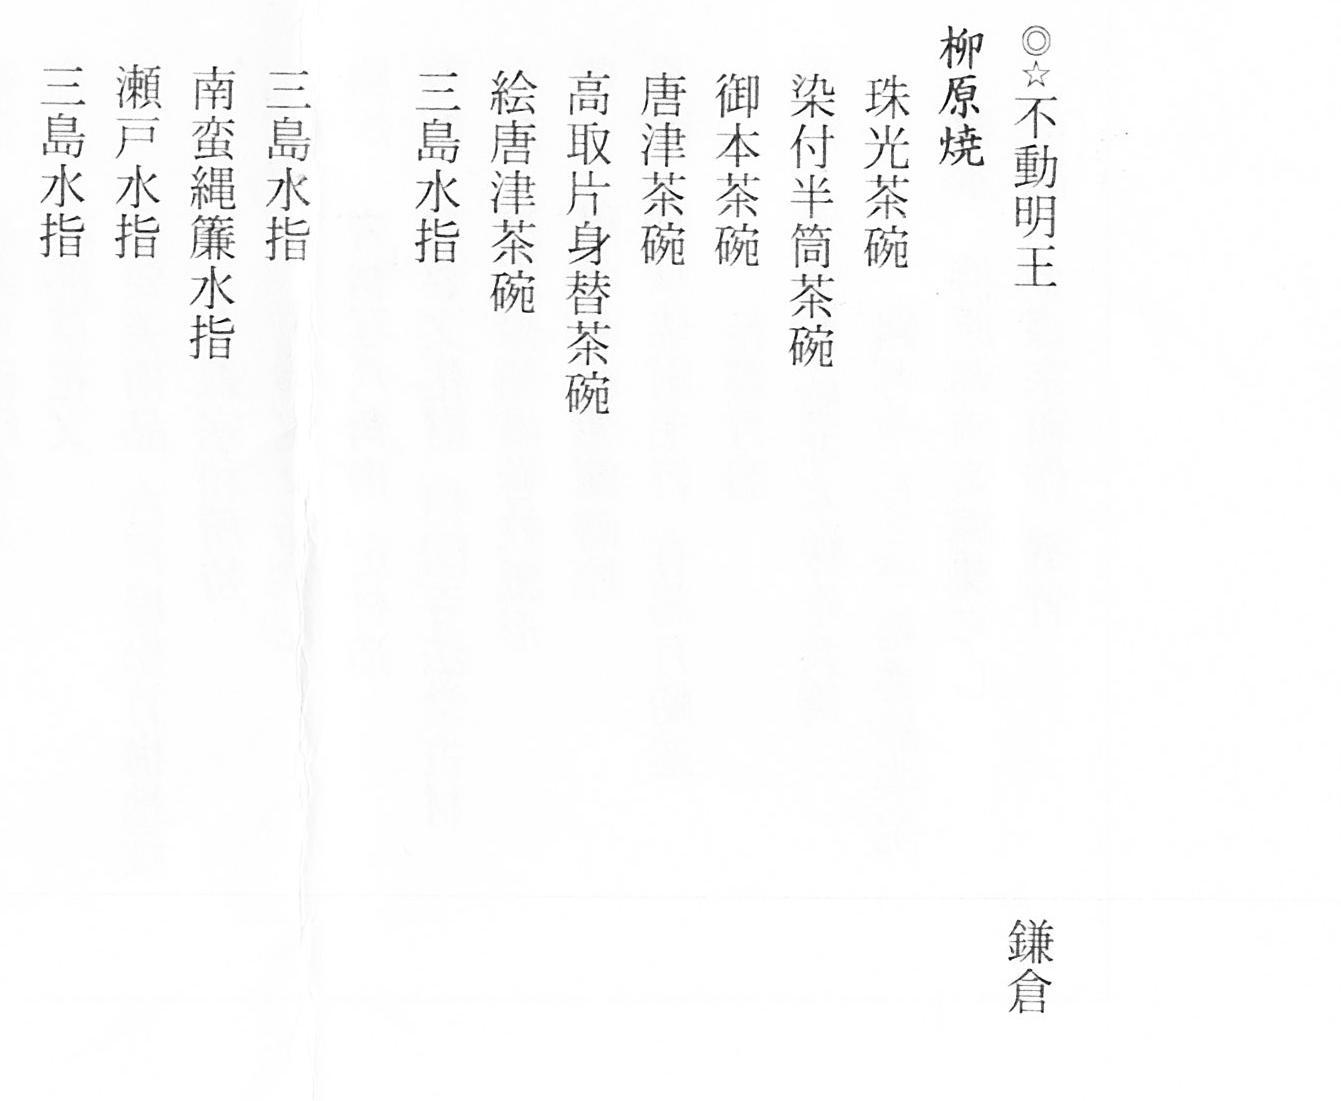 IMG_0001-3.jpg